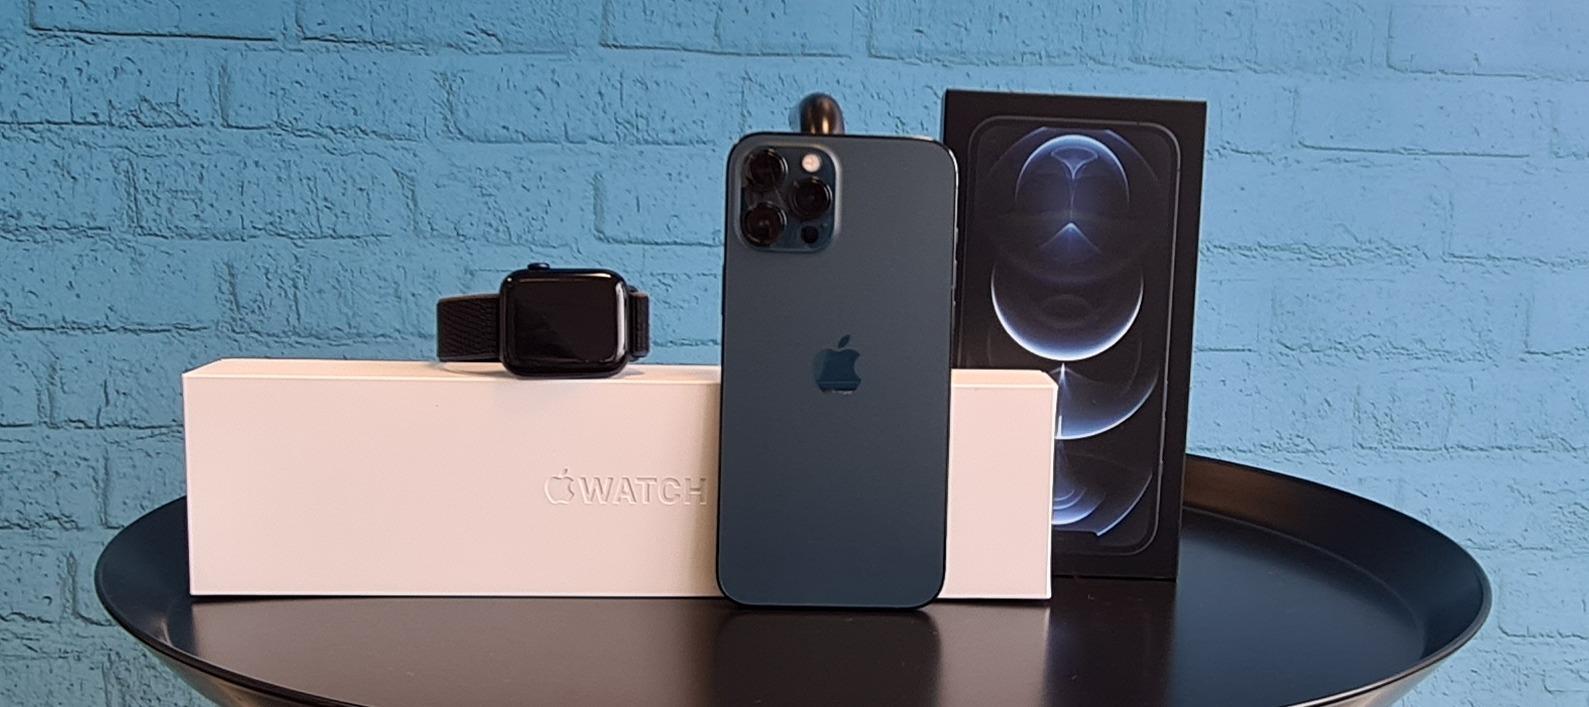 iPhone 12 Pro Max + Apple Watch Series 6 - Teste das Traumbundle